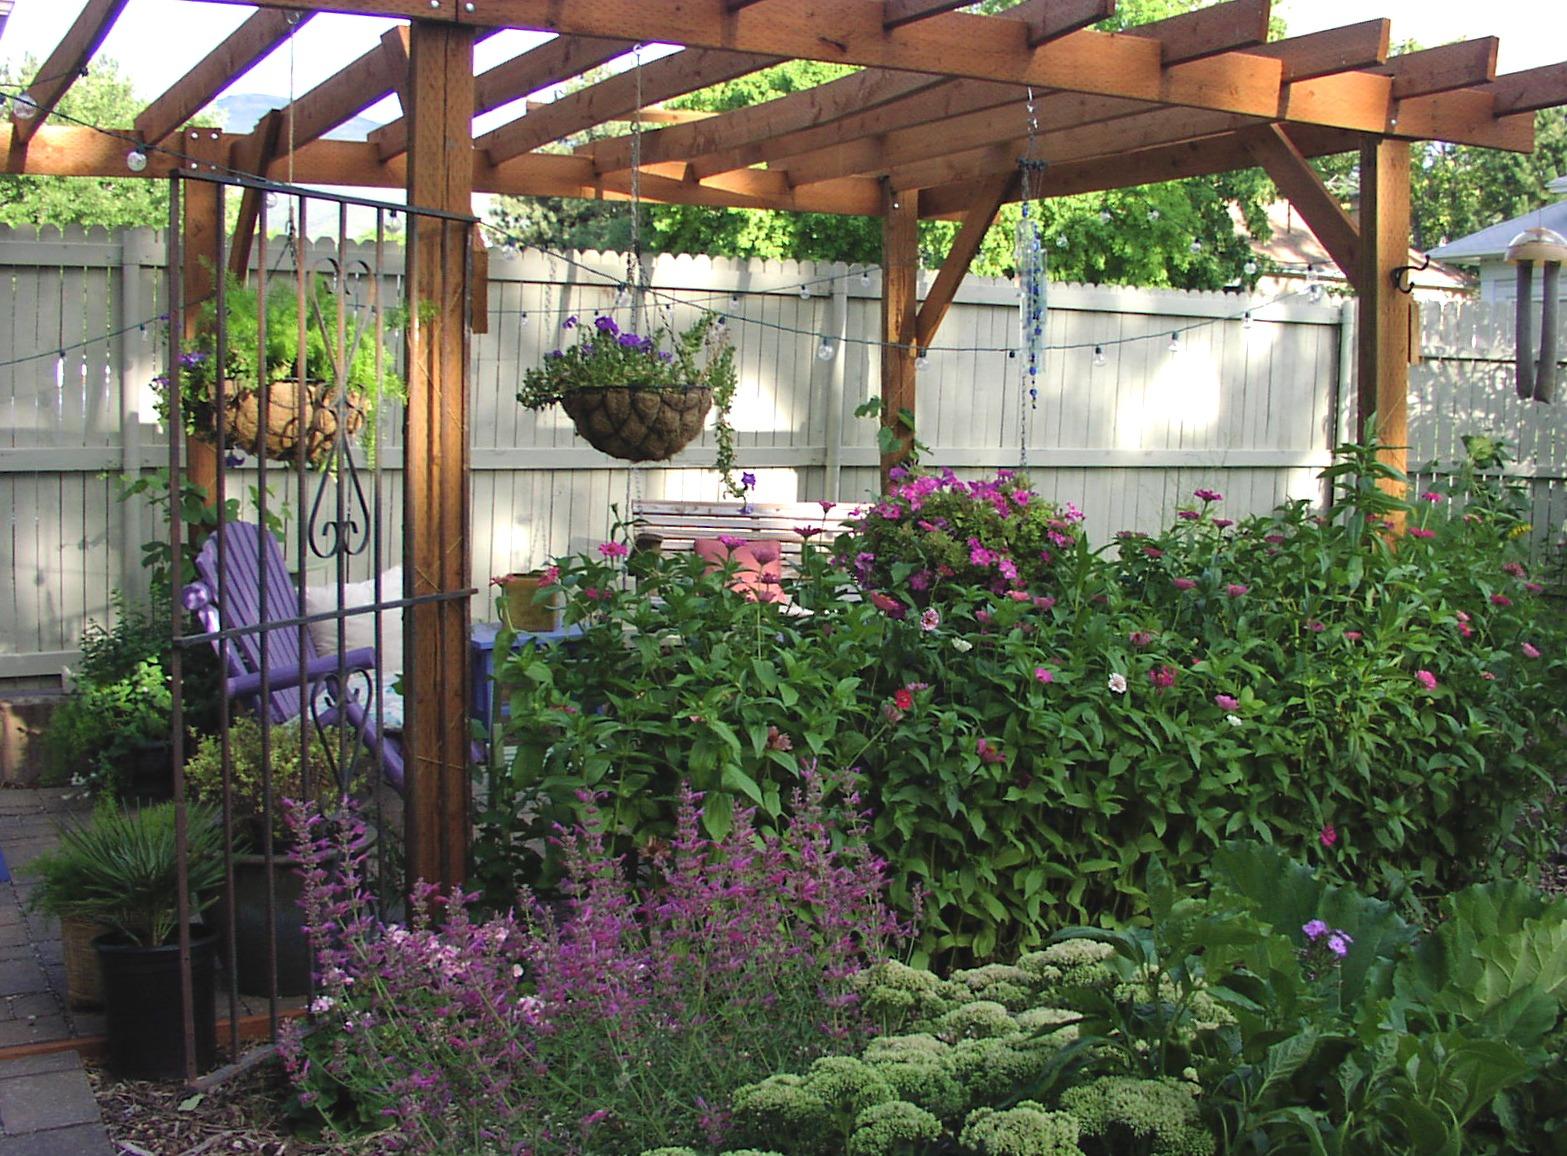 Pergola with Hanging Plants